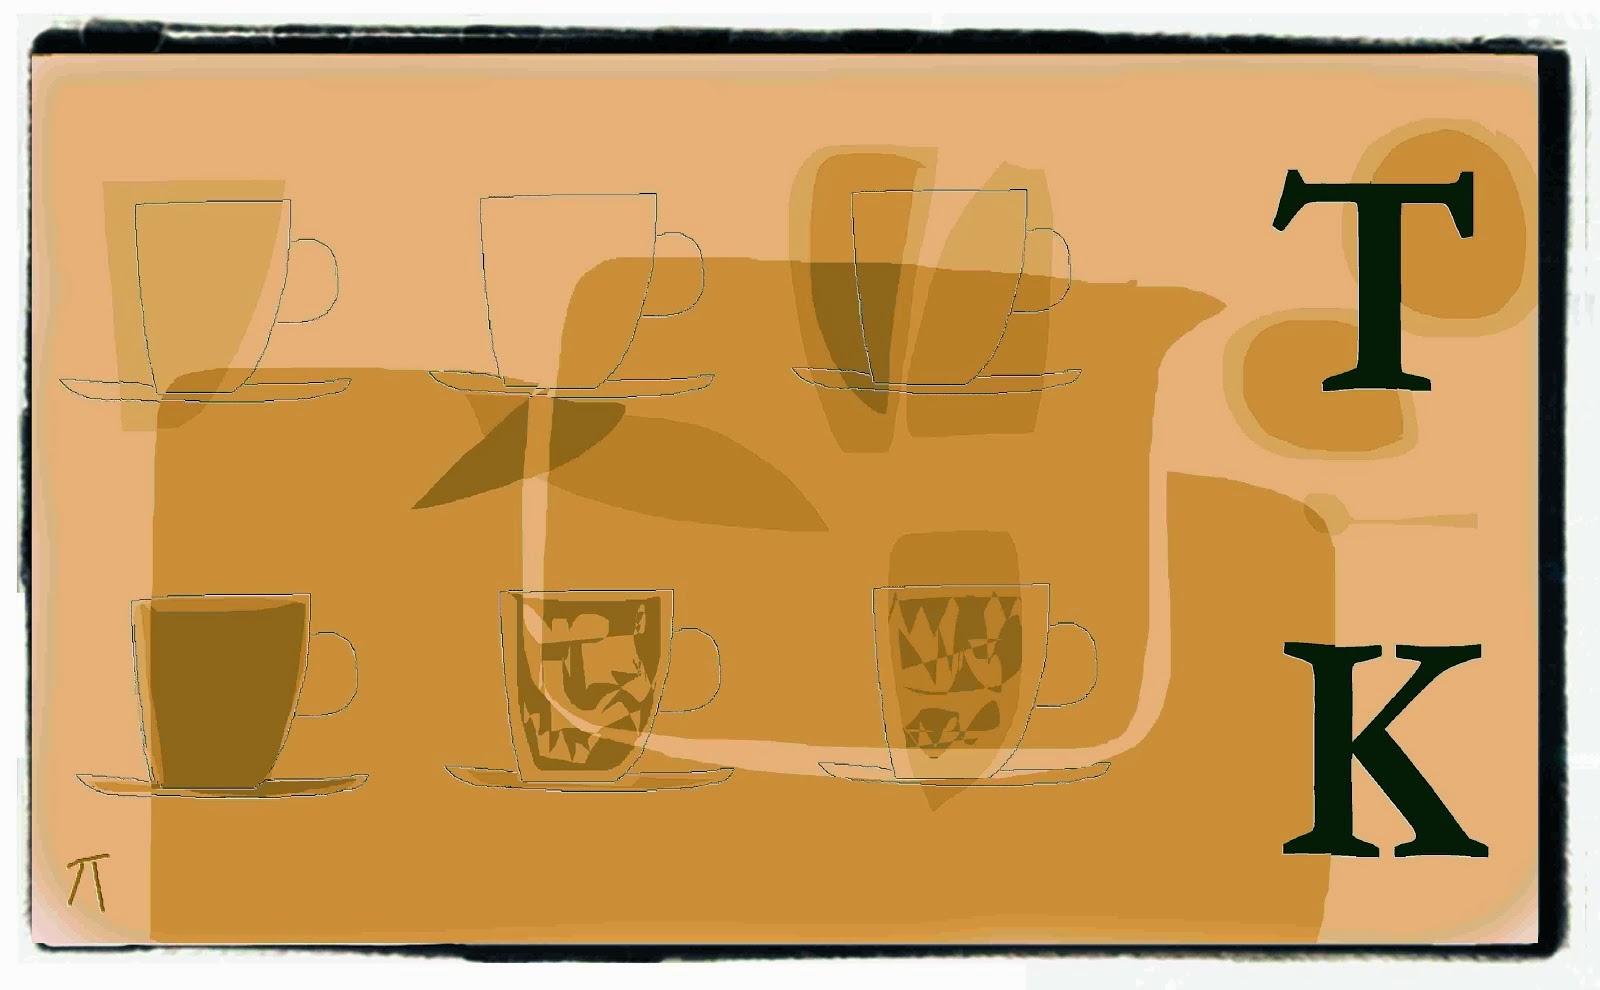 6tk - brambach by mischa vetere 2013